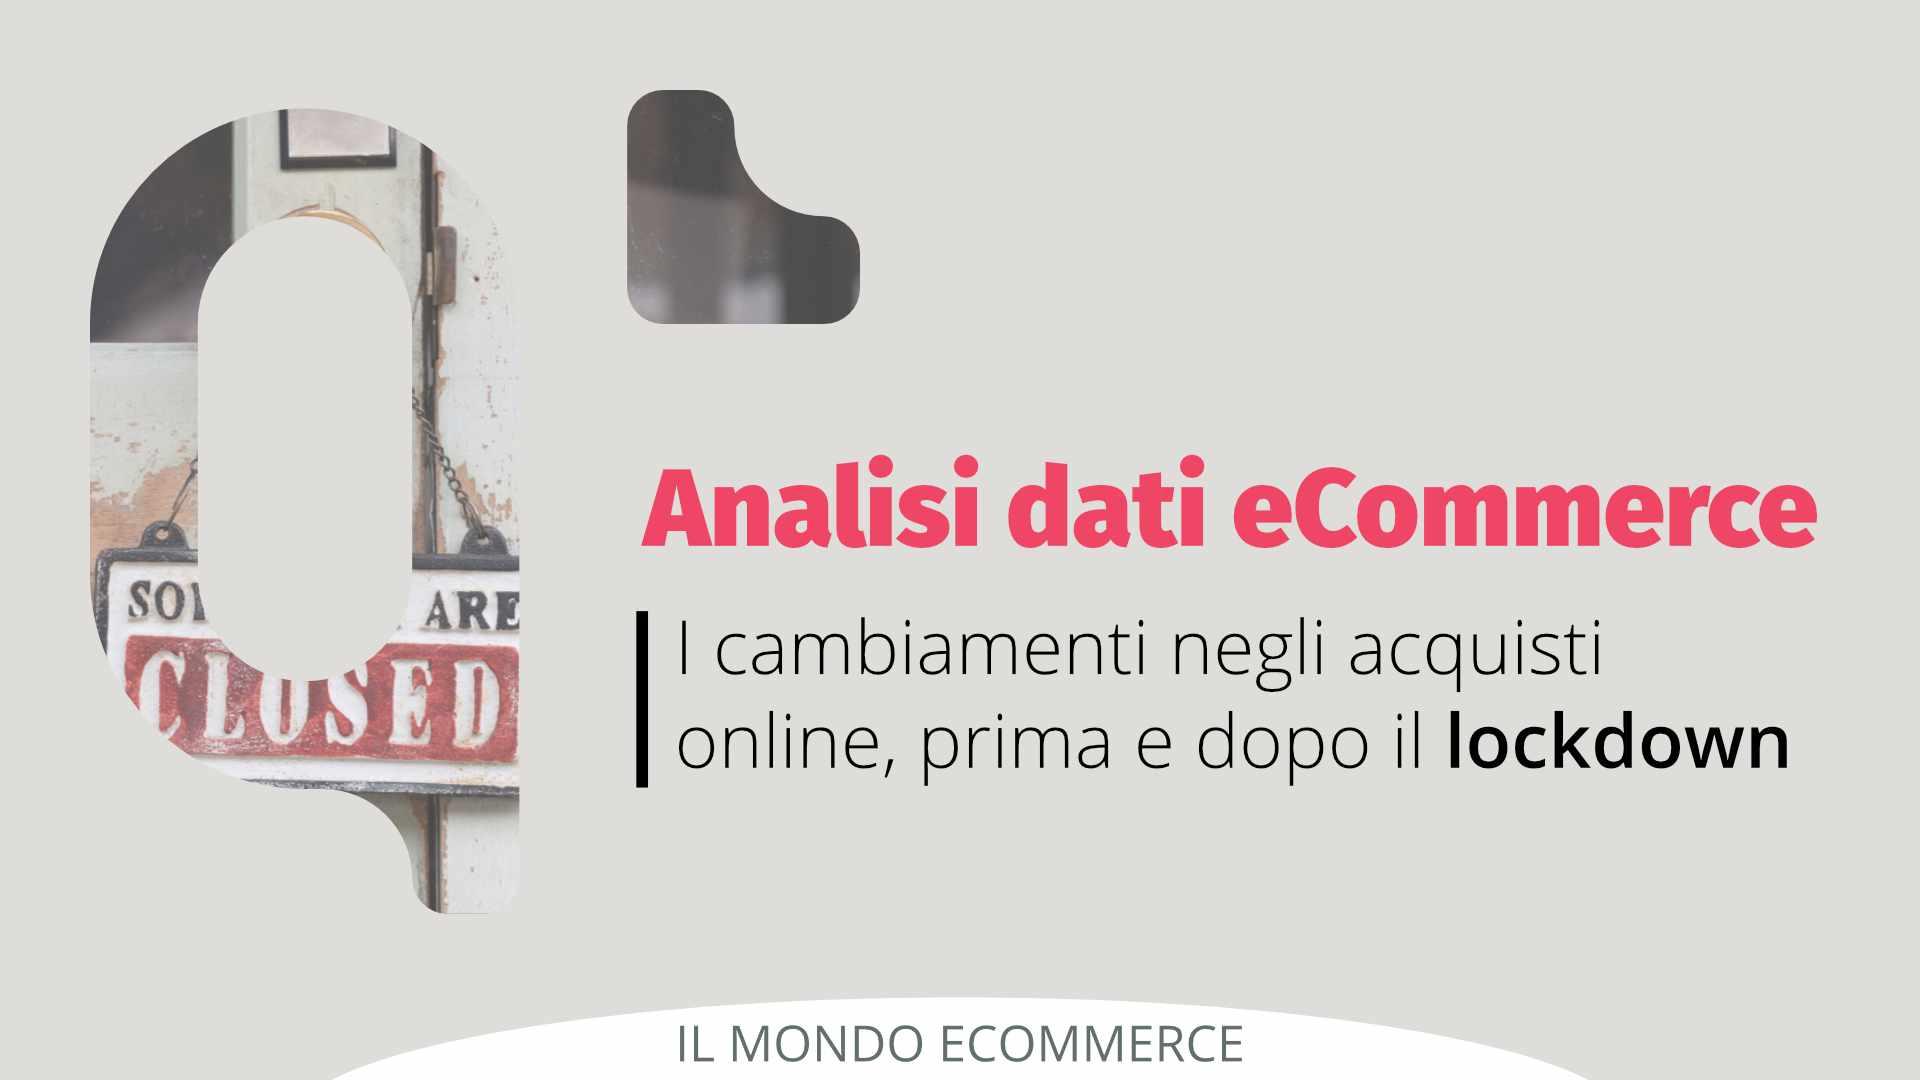 dati eCommerce 2019-2020